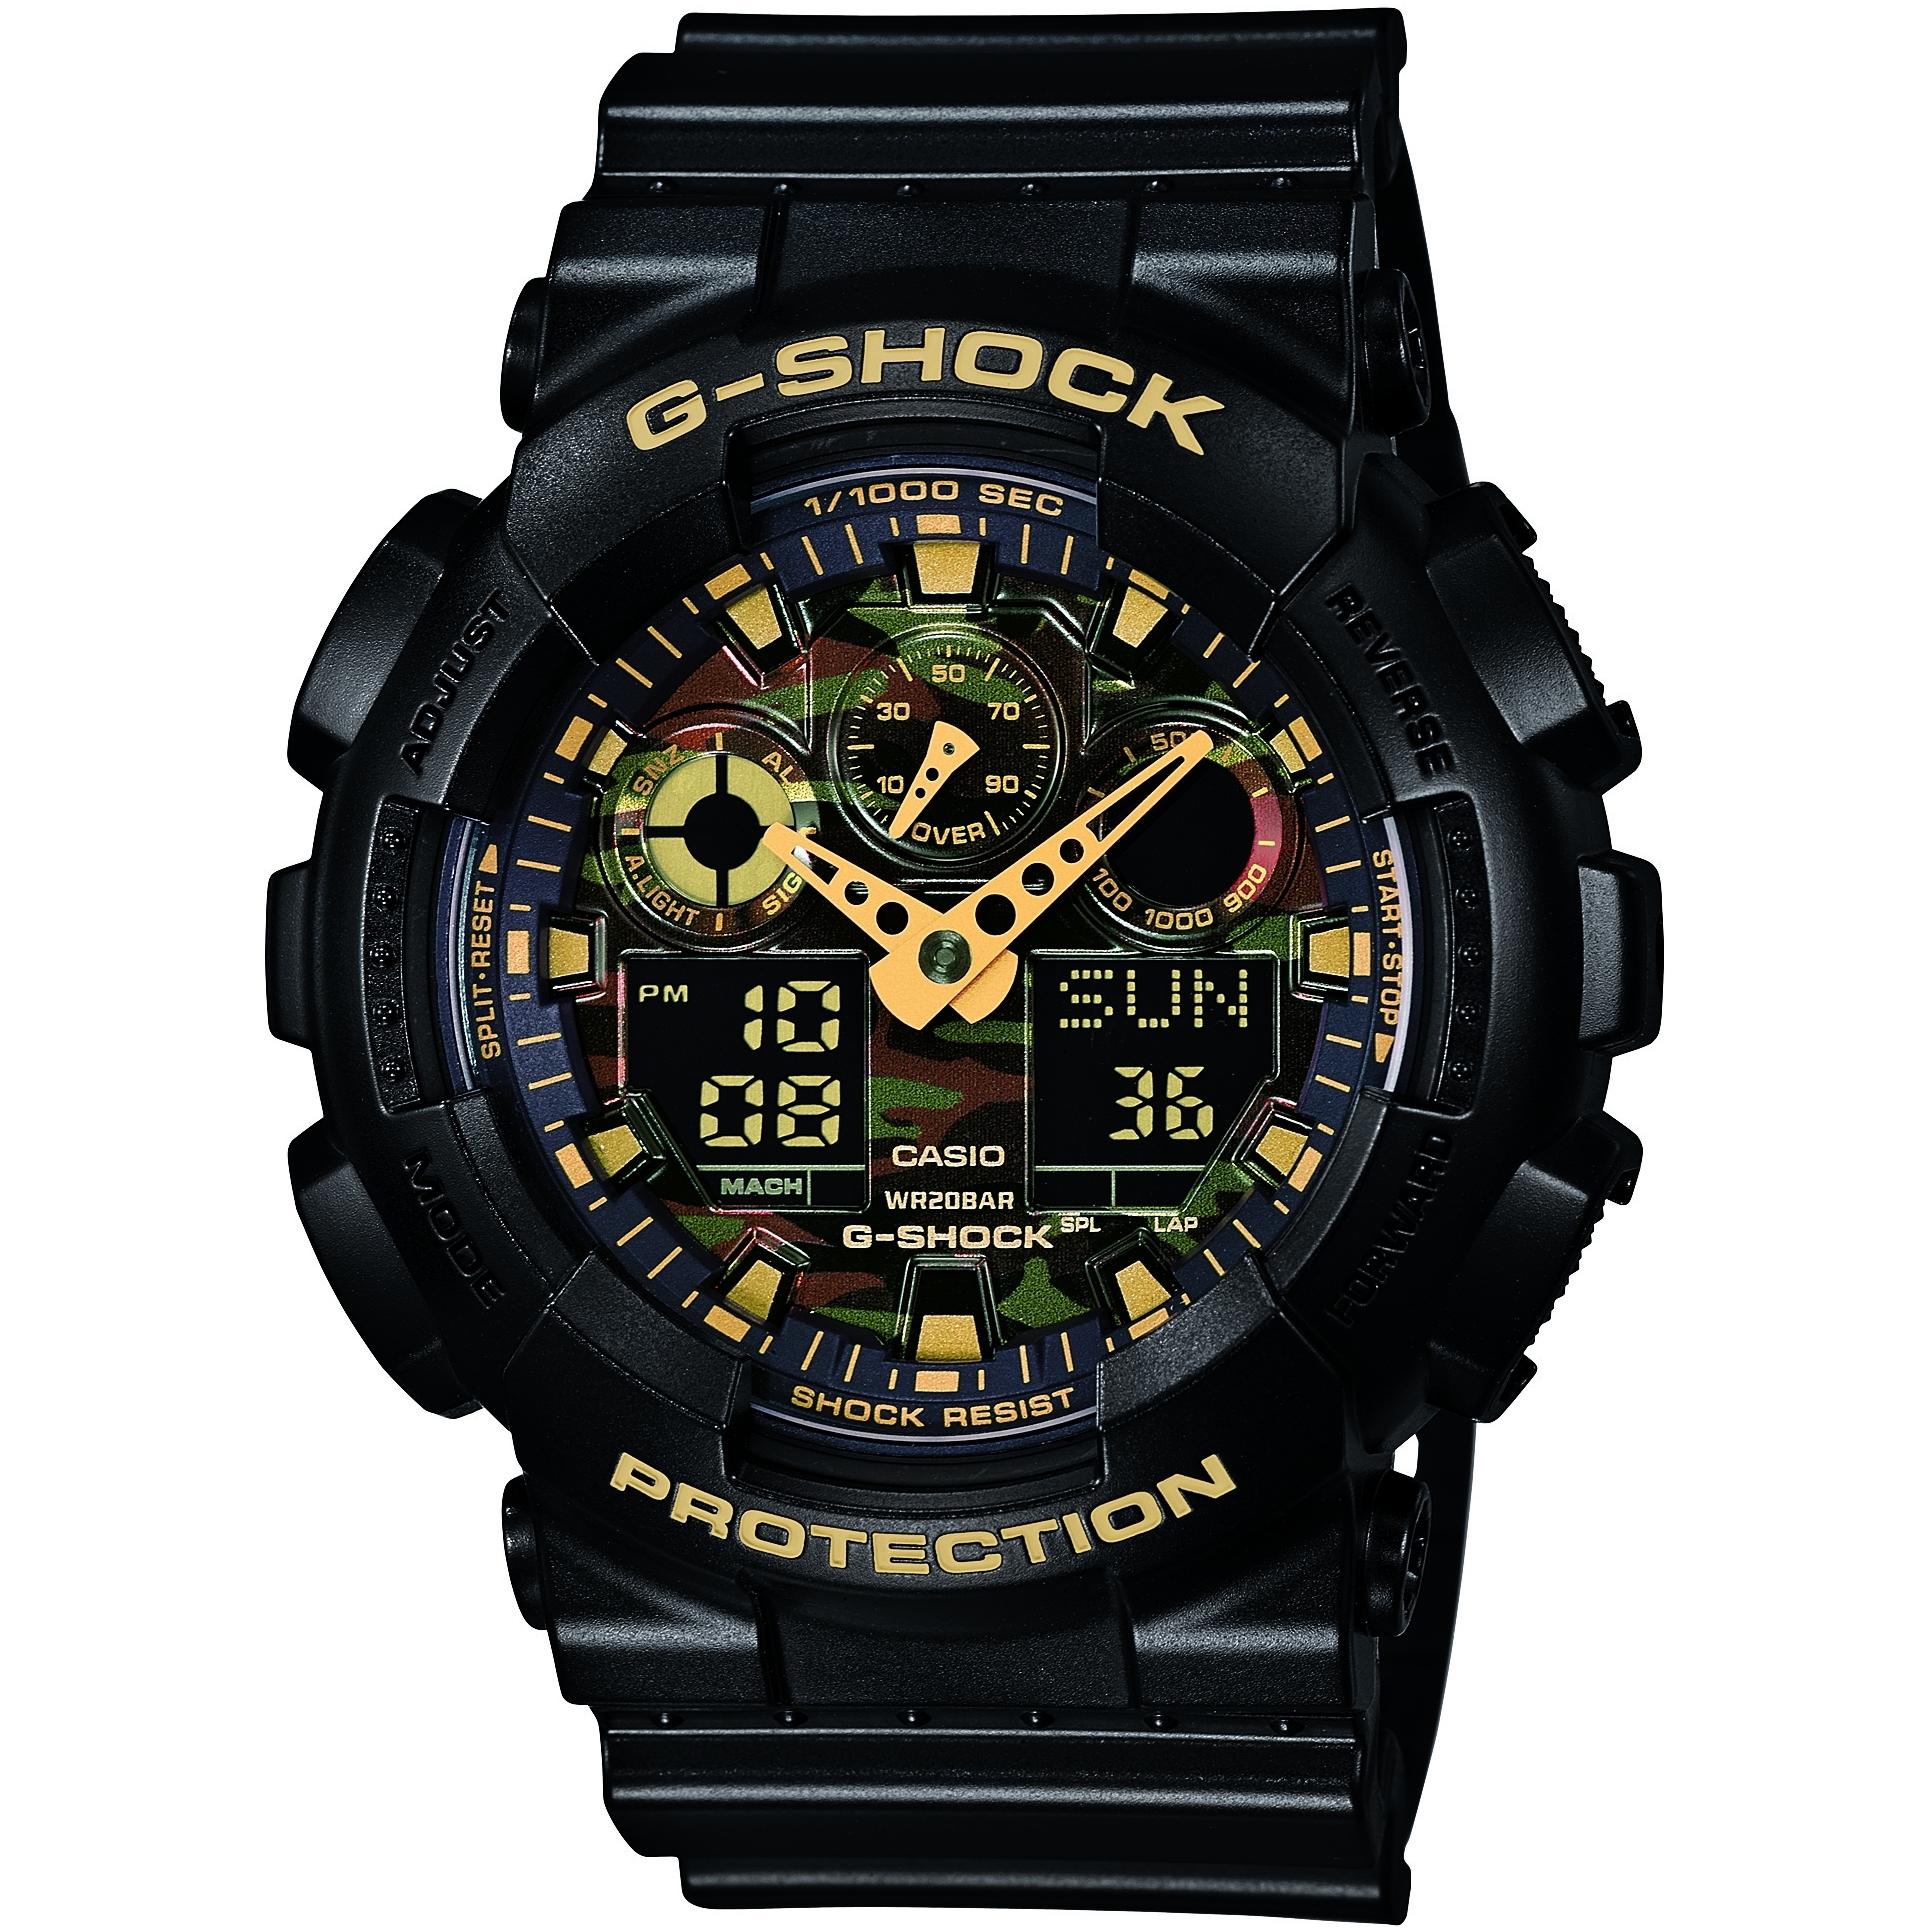 c5569d38d3bf Gents Casio G-Shock Alarm Chronograph Watch (GA-100CF-1A9ER ...